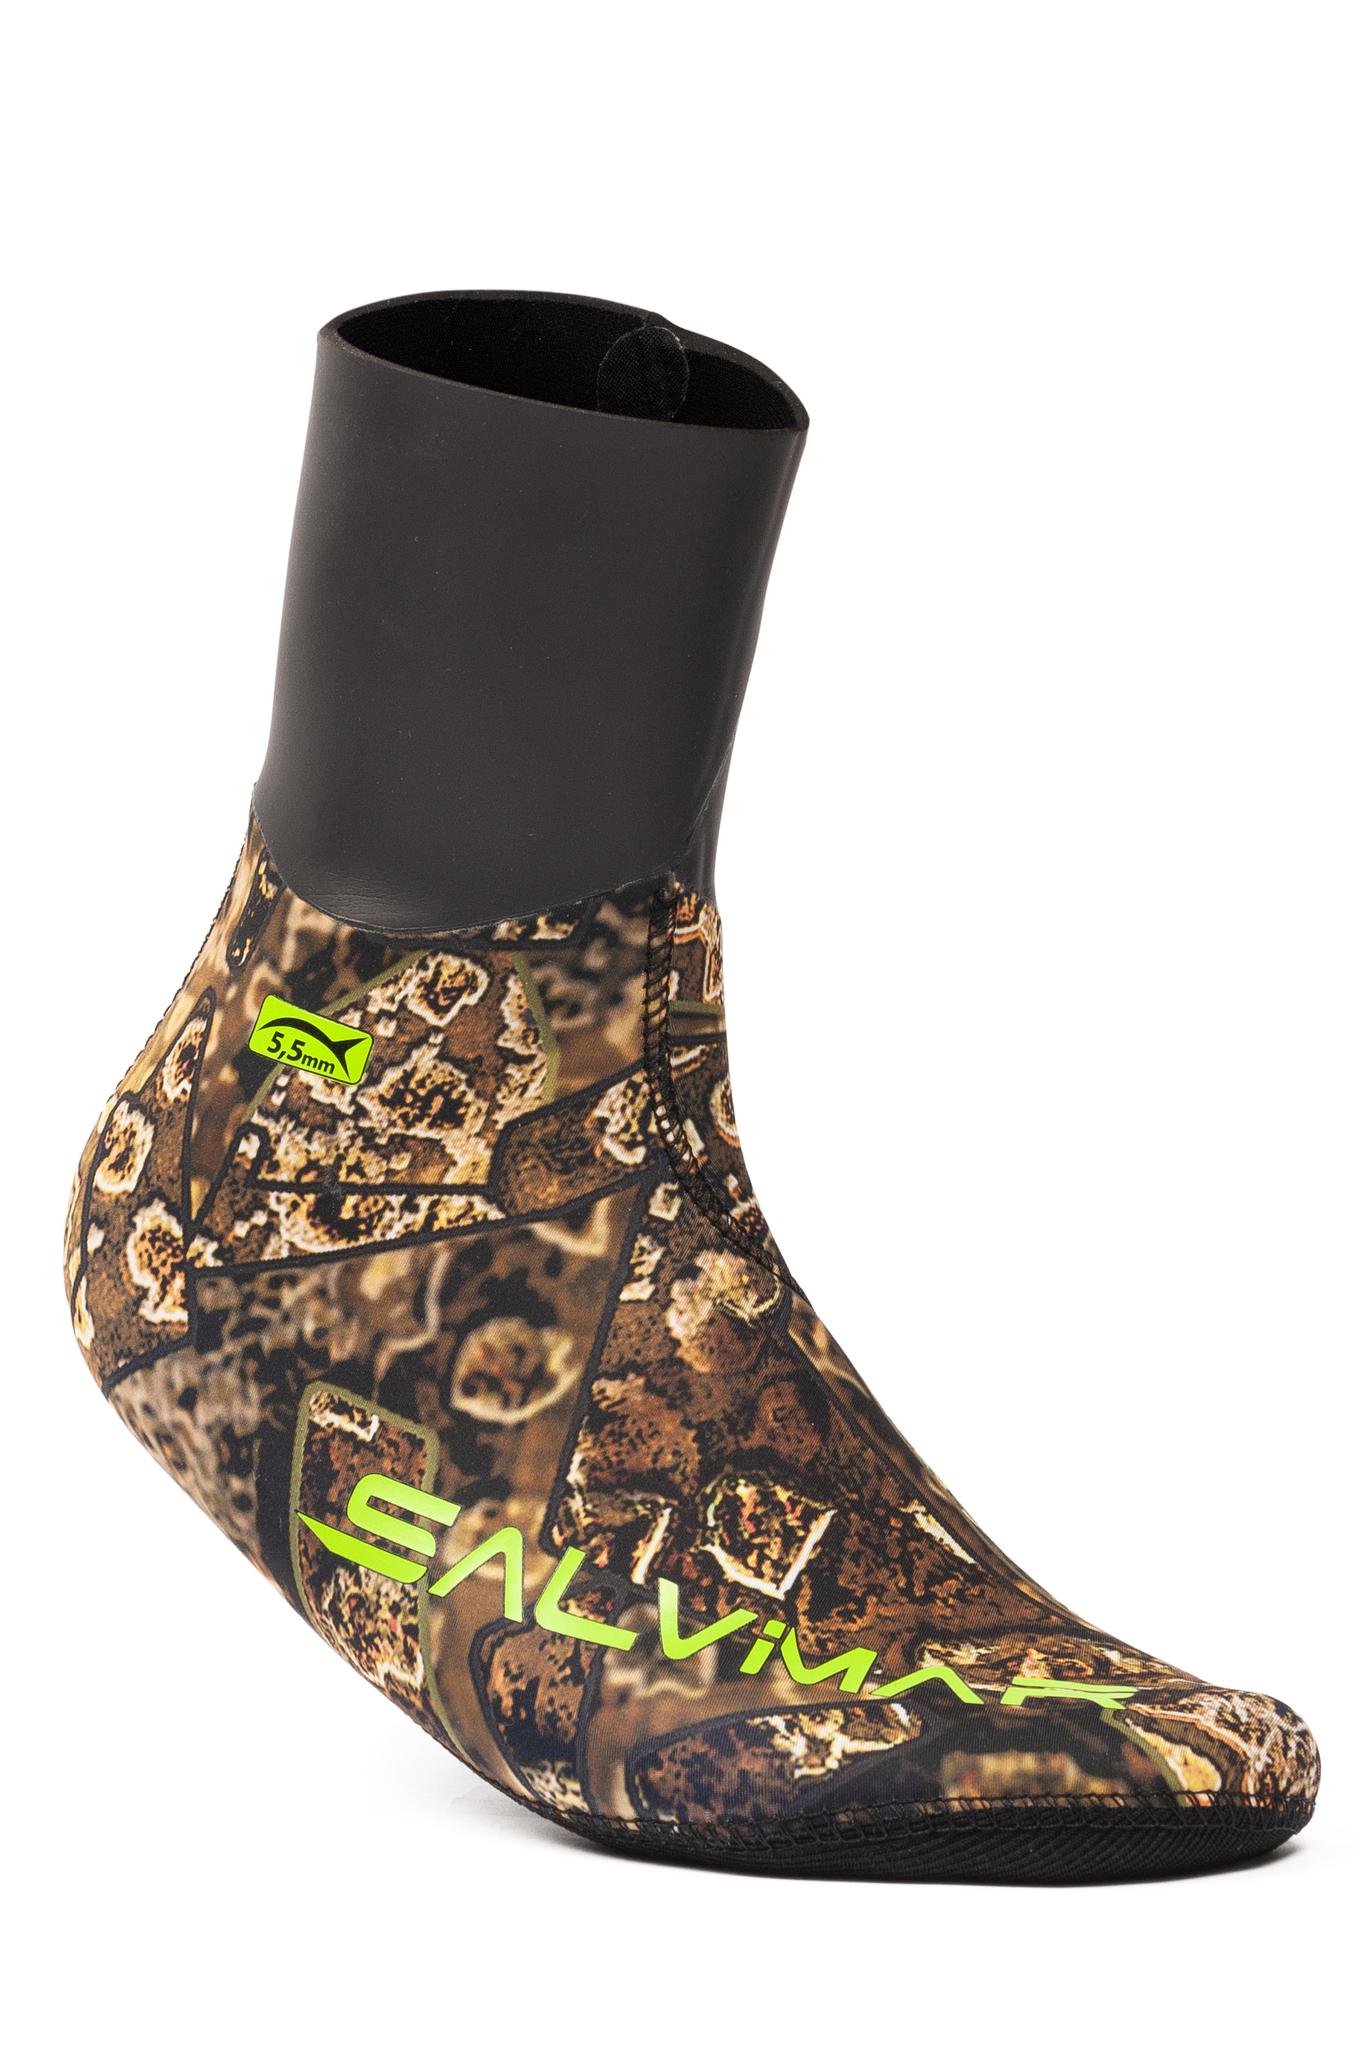 Носки Salvimar Garda Krypsis 5 мм